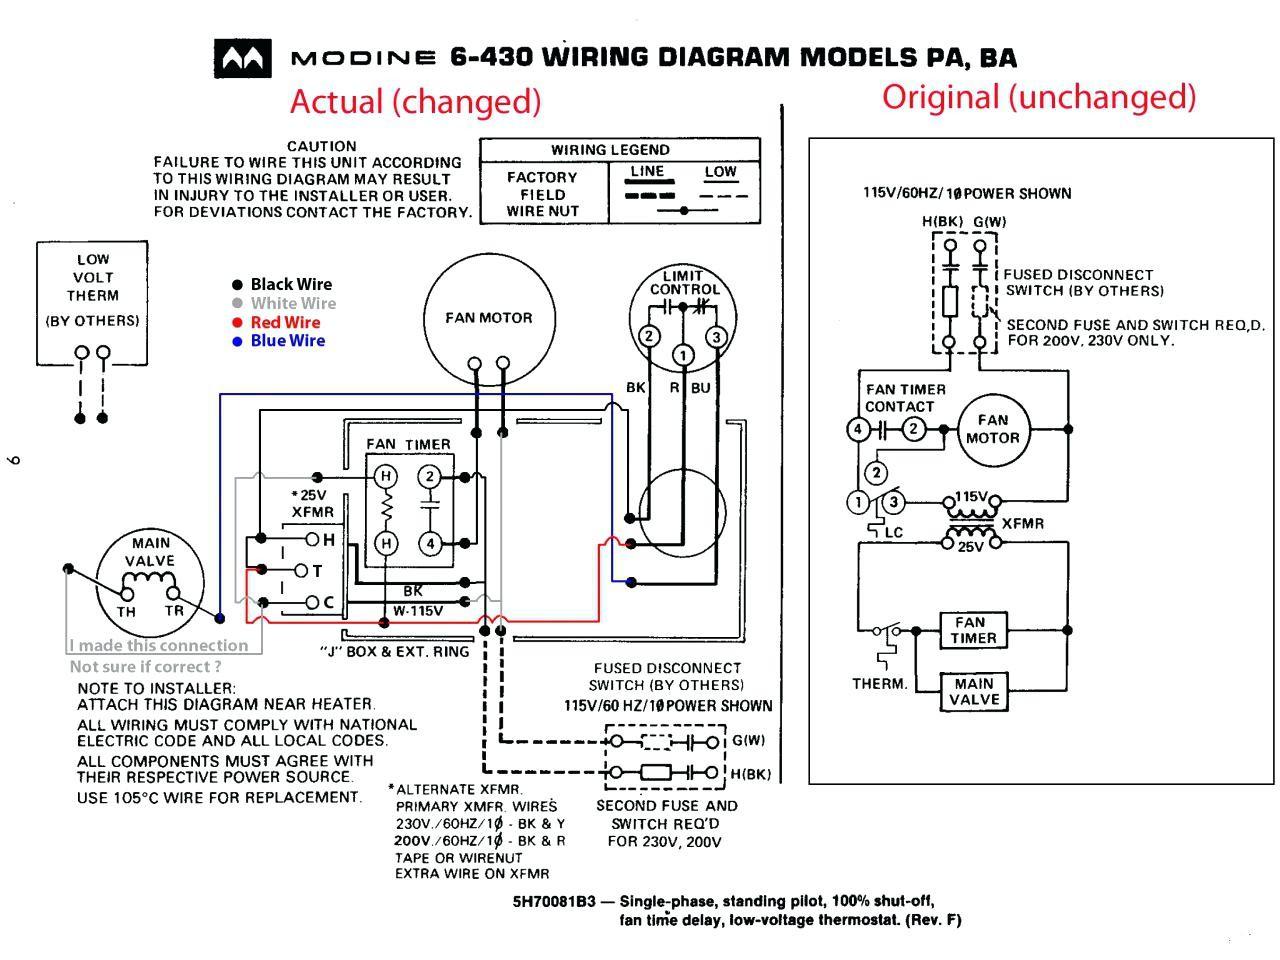 Wiring Diagram For Fedders A  C Condenser Fan Motor